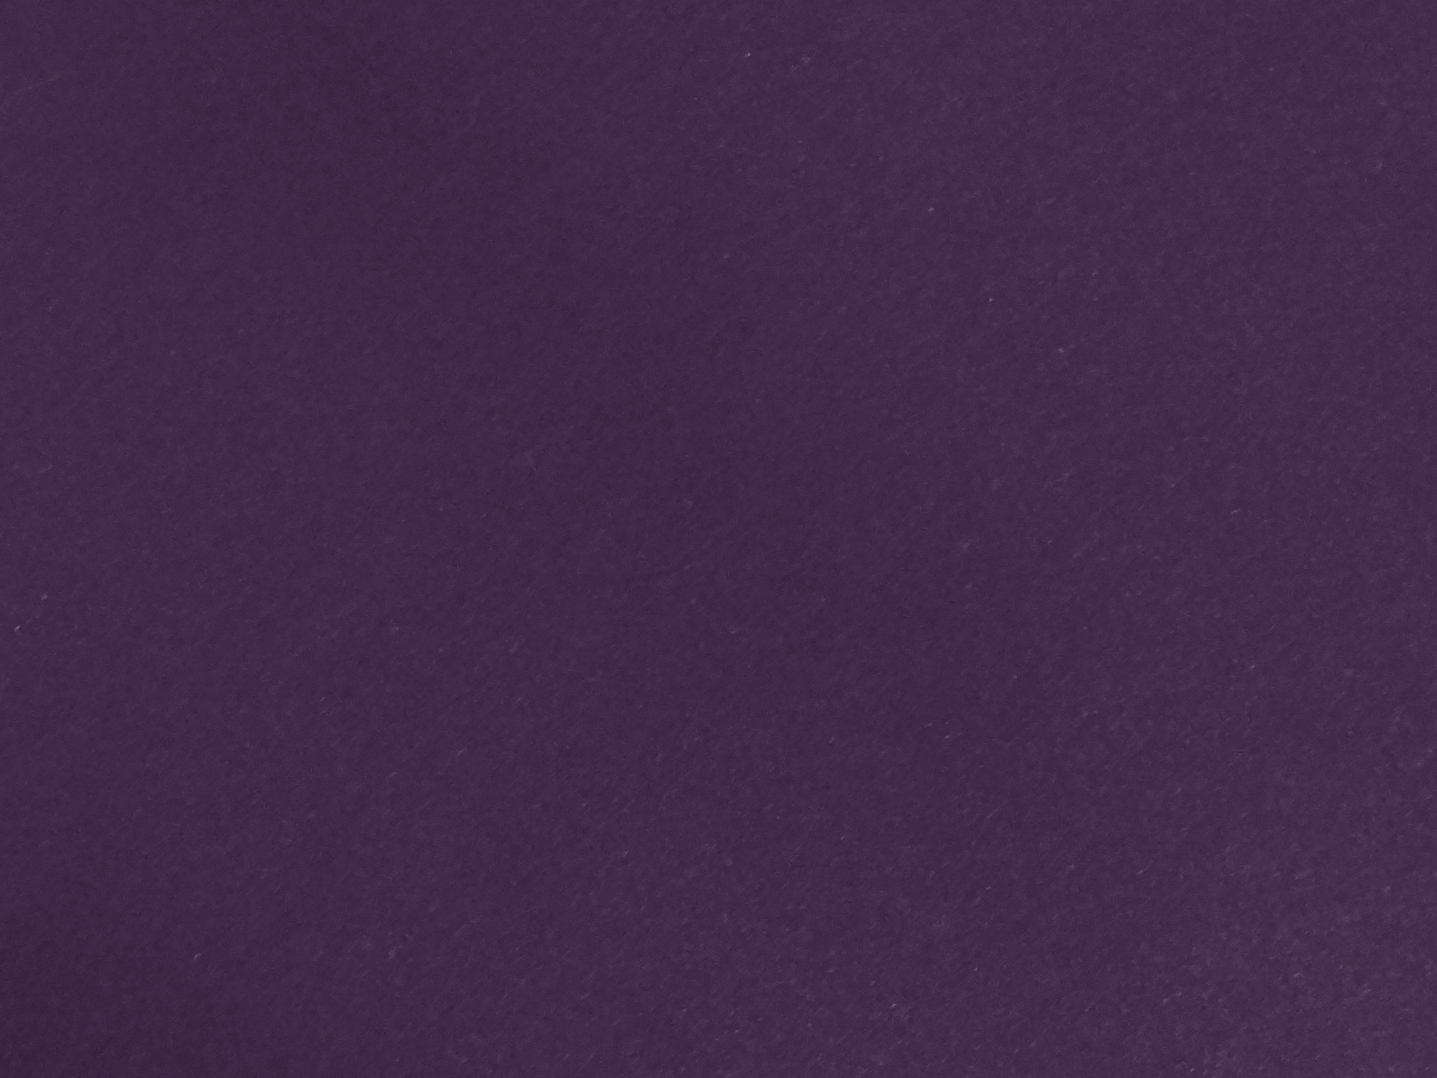 Bastelvlies A4, Violett